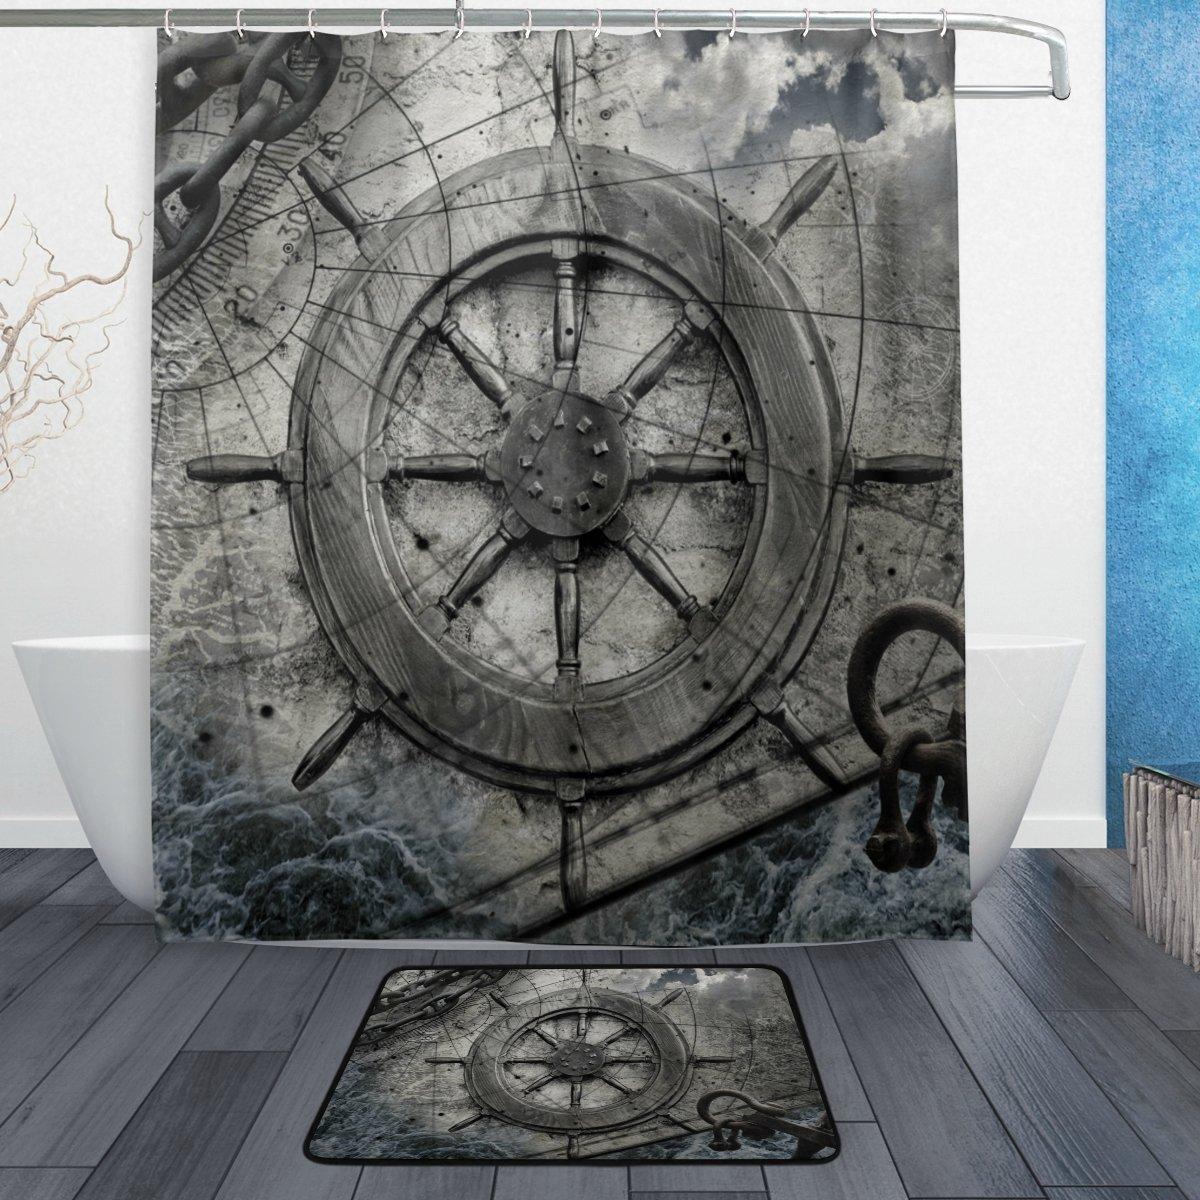 Ancient Navigation Map Shower Curtain Liner Bathroom Mat Polyester Fabric Hooks